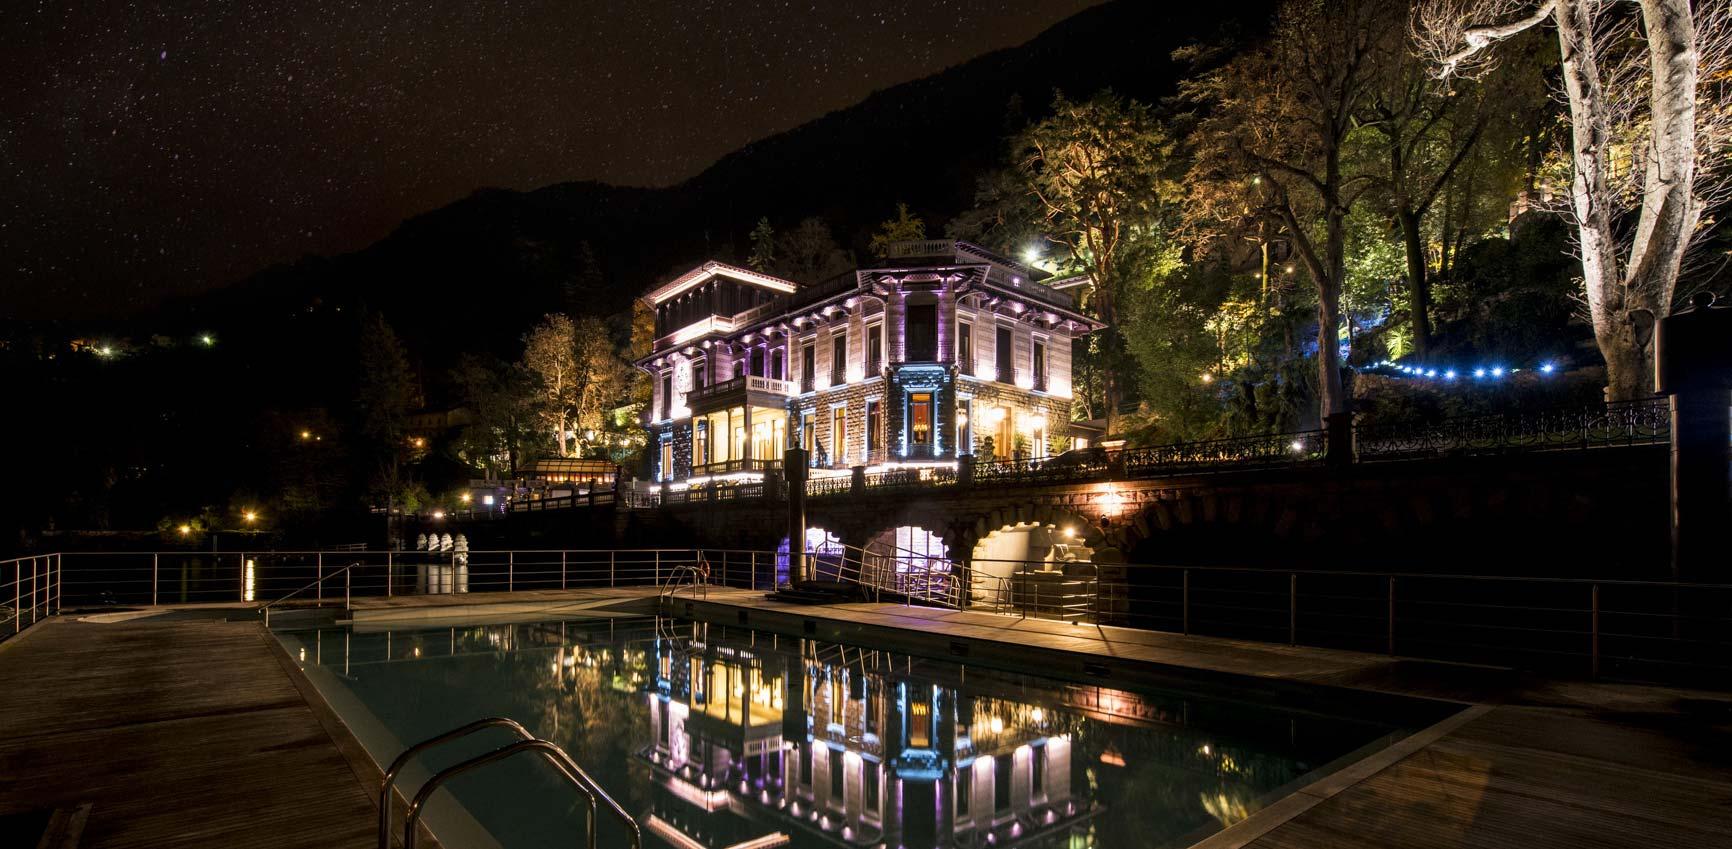 Castadiva resort lake como a local guide - Casta diva resort ...